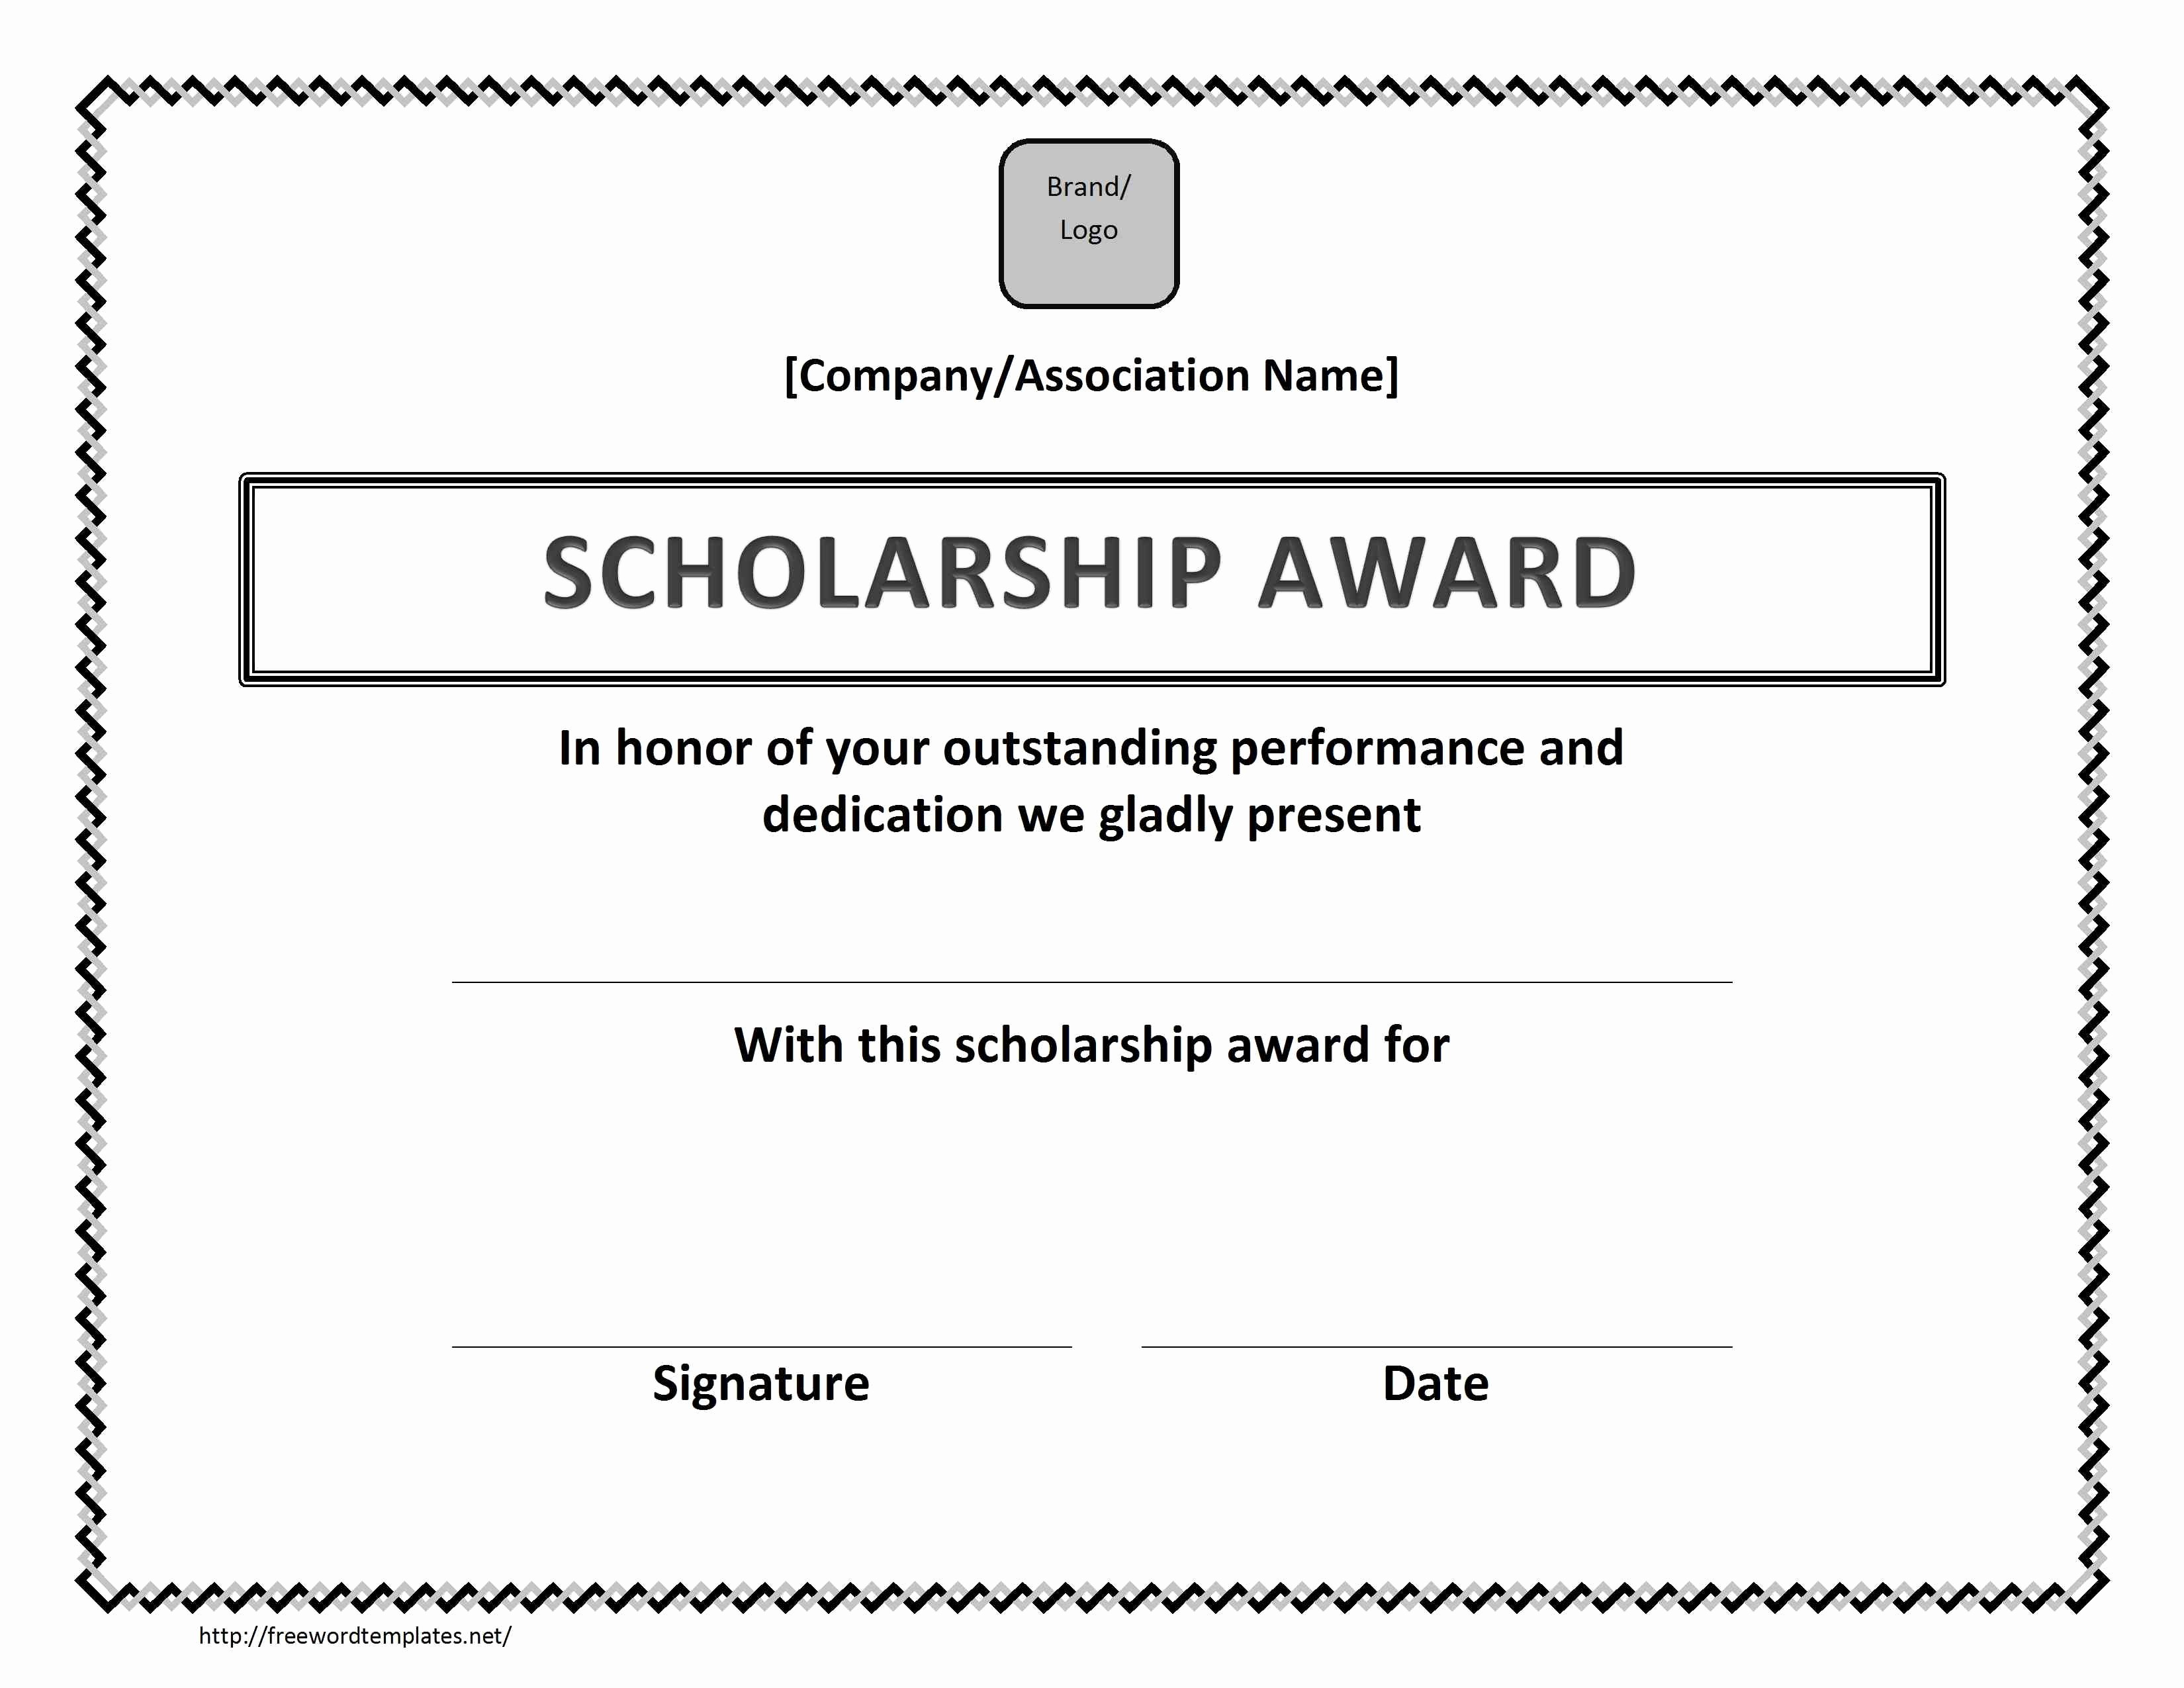 Award Certificate Template Microsoft Word Unique Scholarship Award Certificate Template Free Microsoft Word